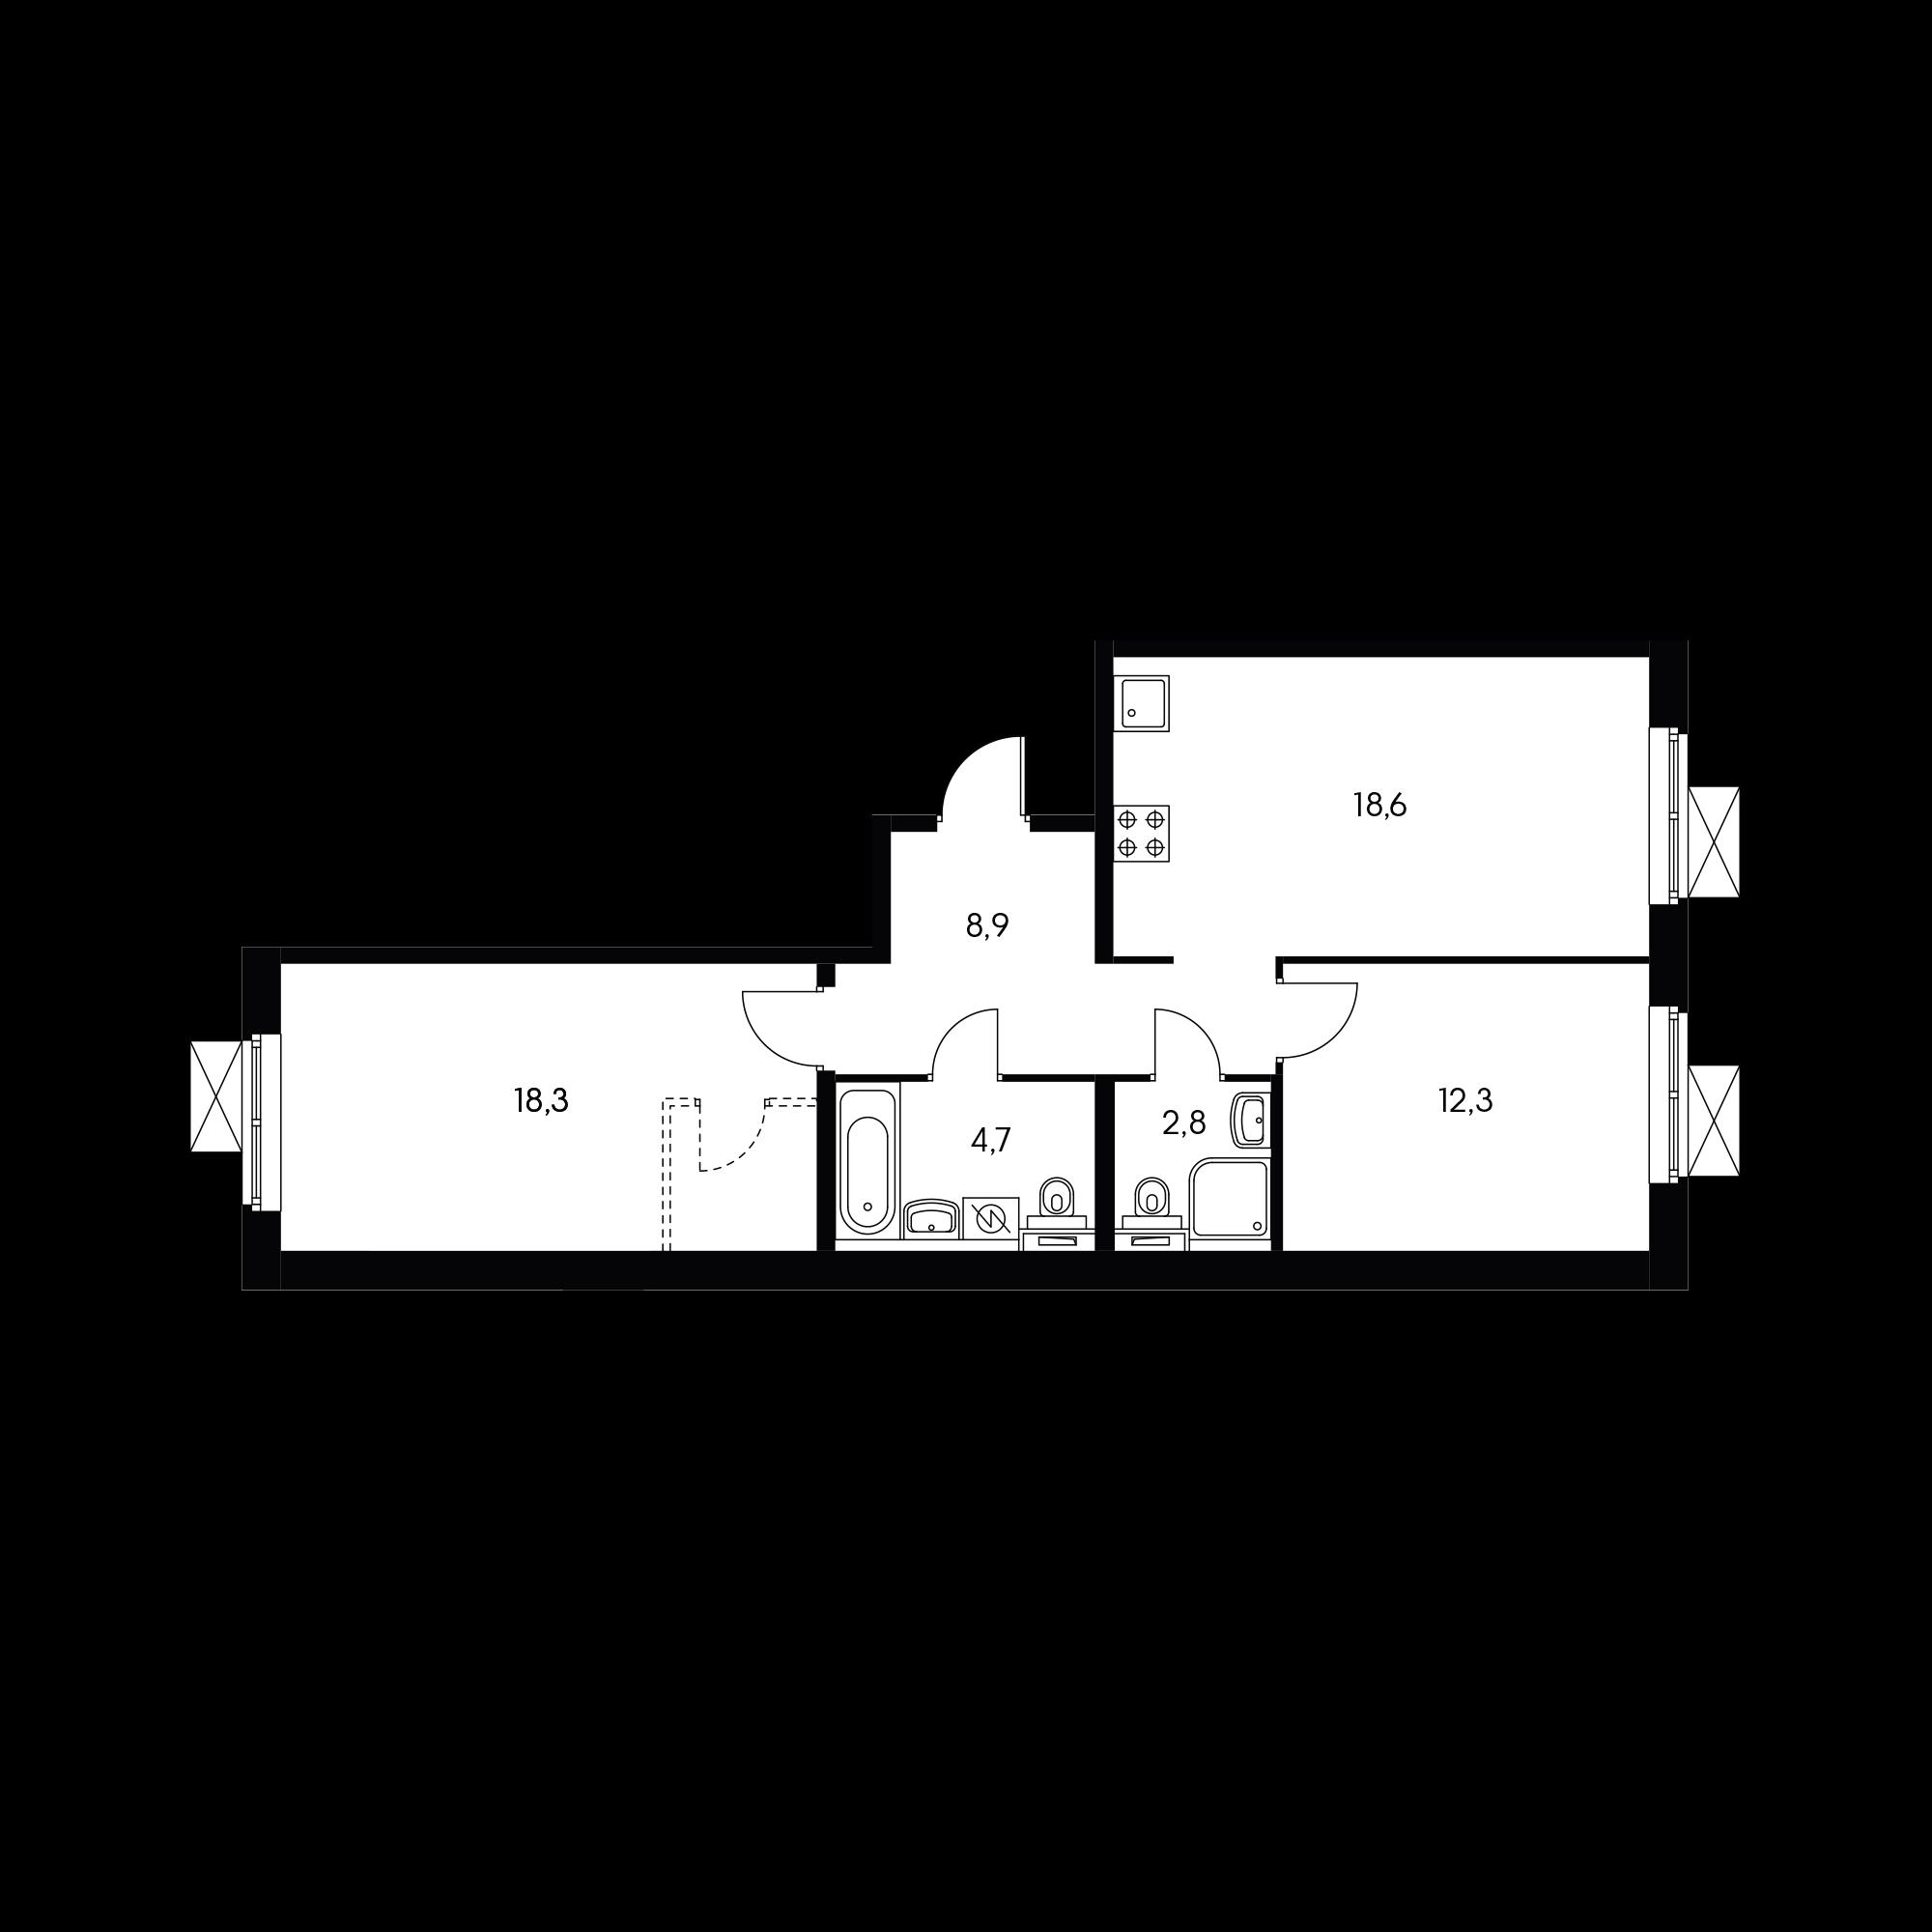 2EL3_6.6-1*